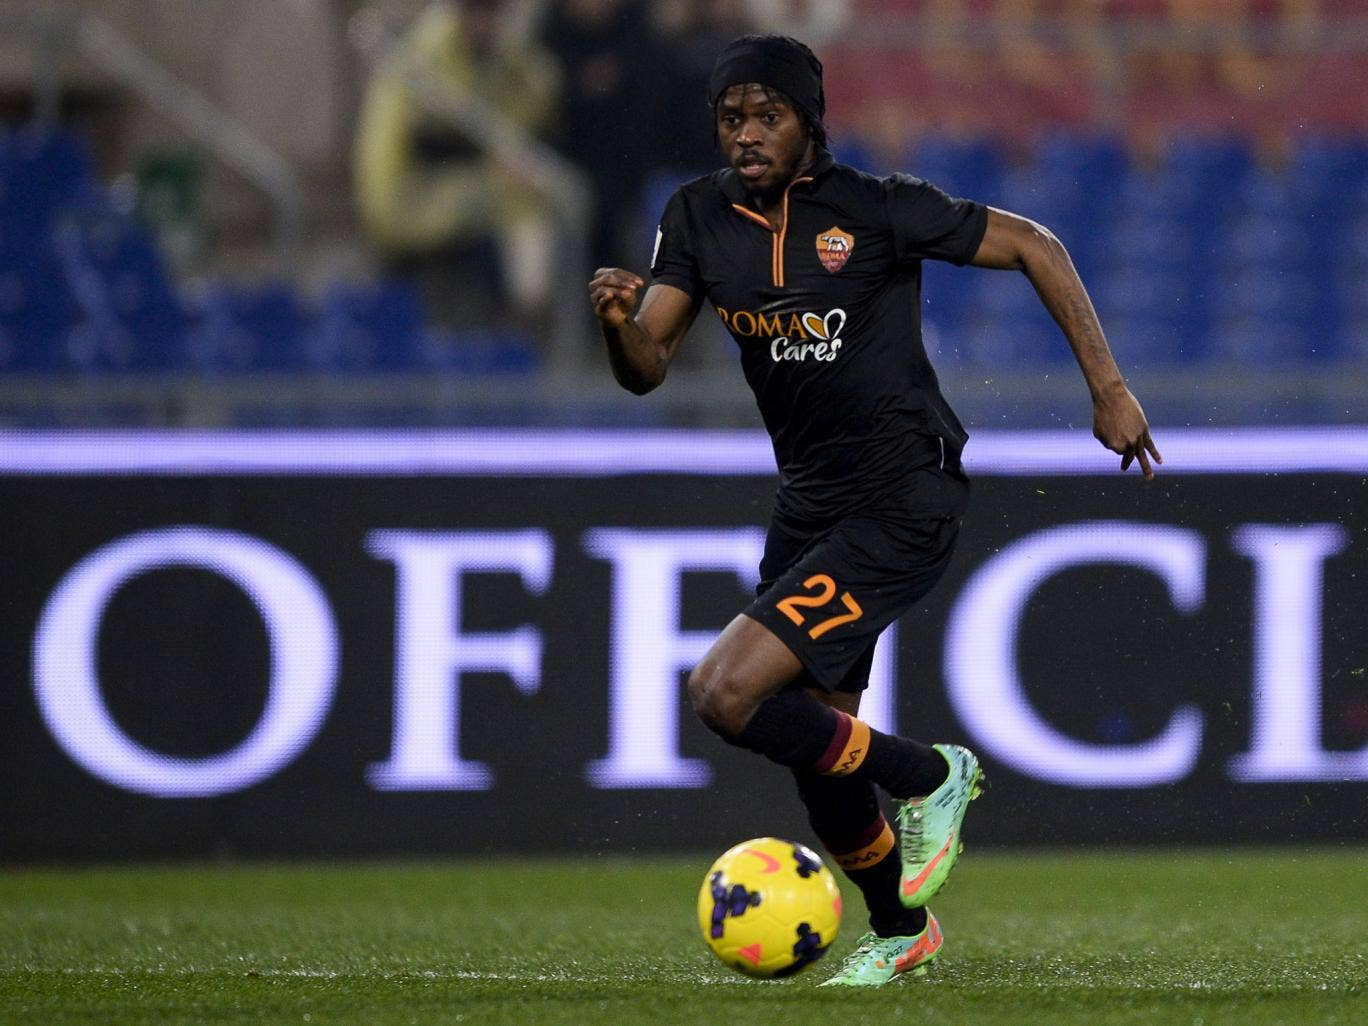 Roma forward Gervinho scored twice in the 3-2 win over Napoli